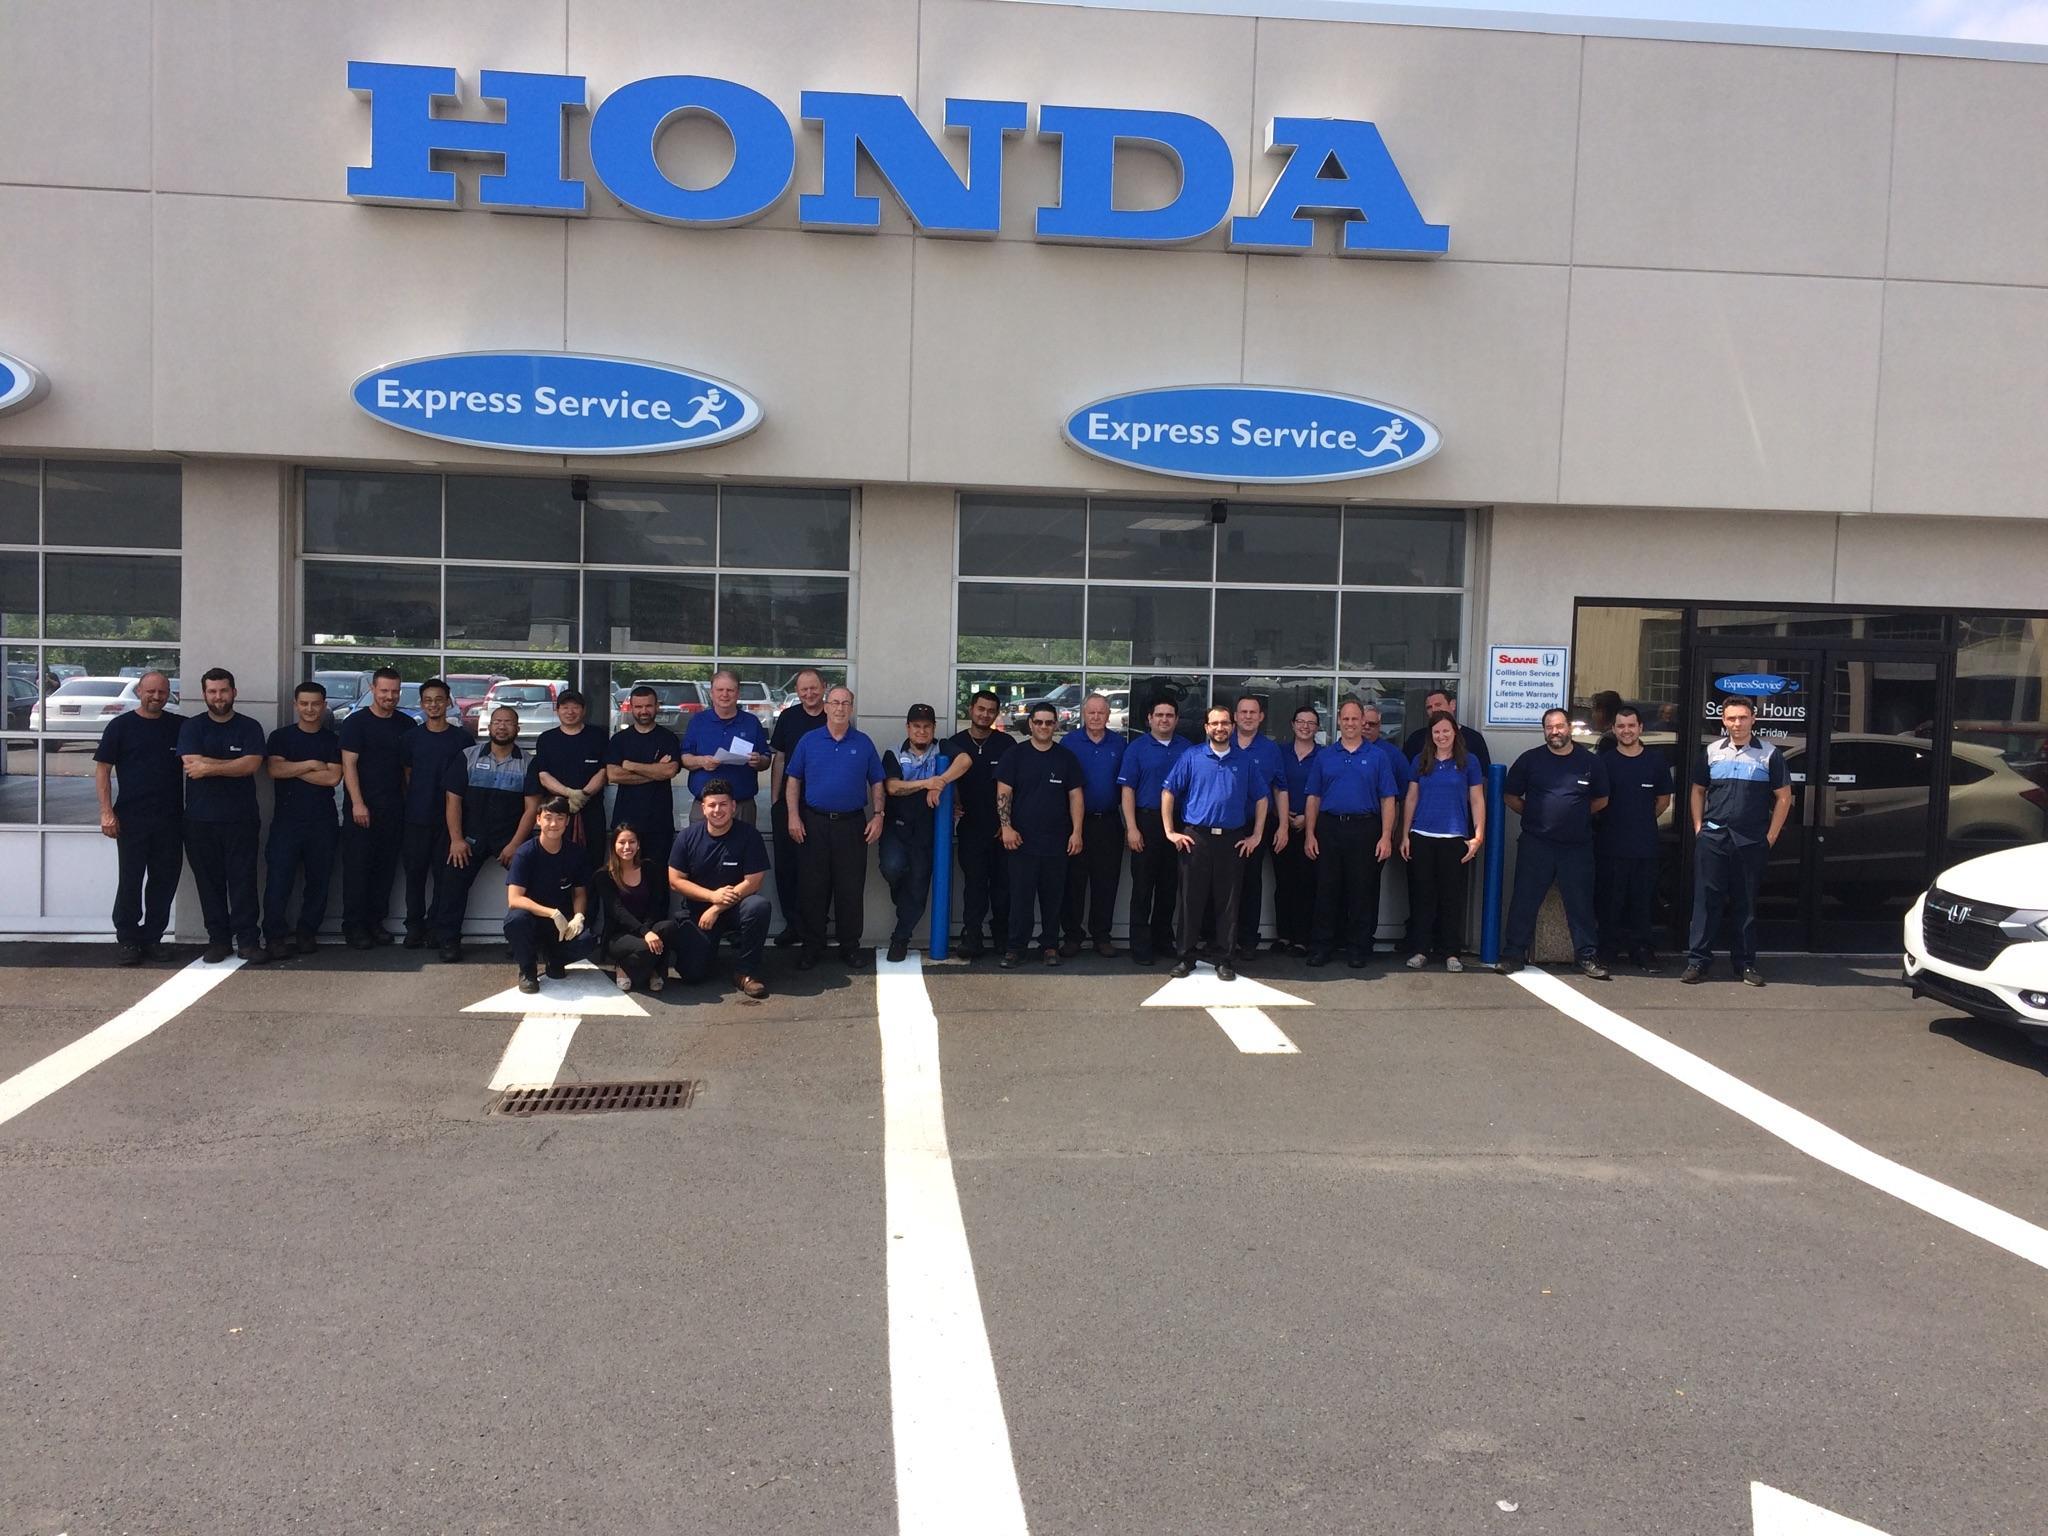 Sloane honda philadelphia staff for Honda dealership philadelphia pa